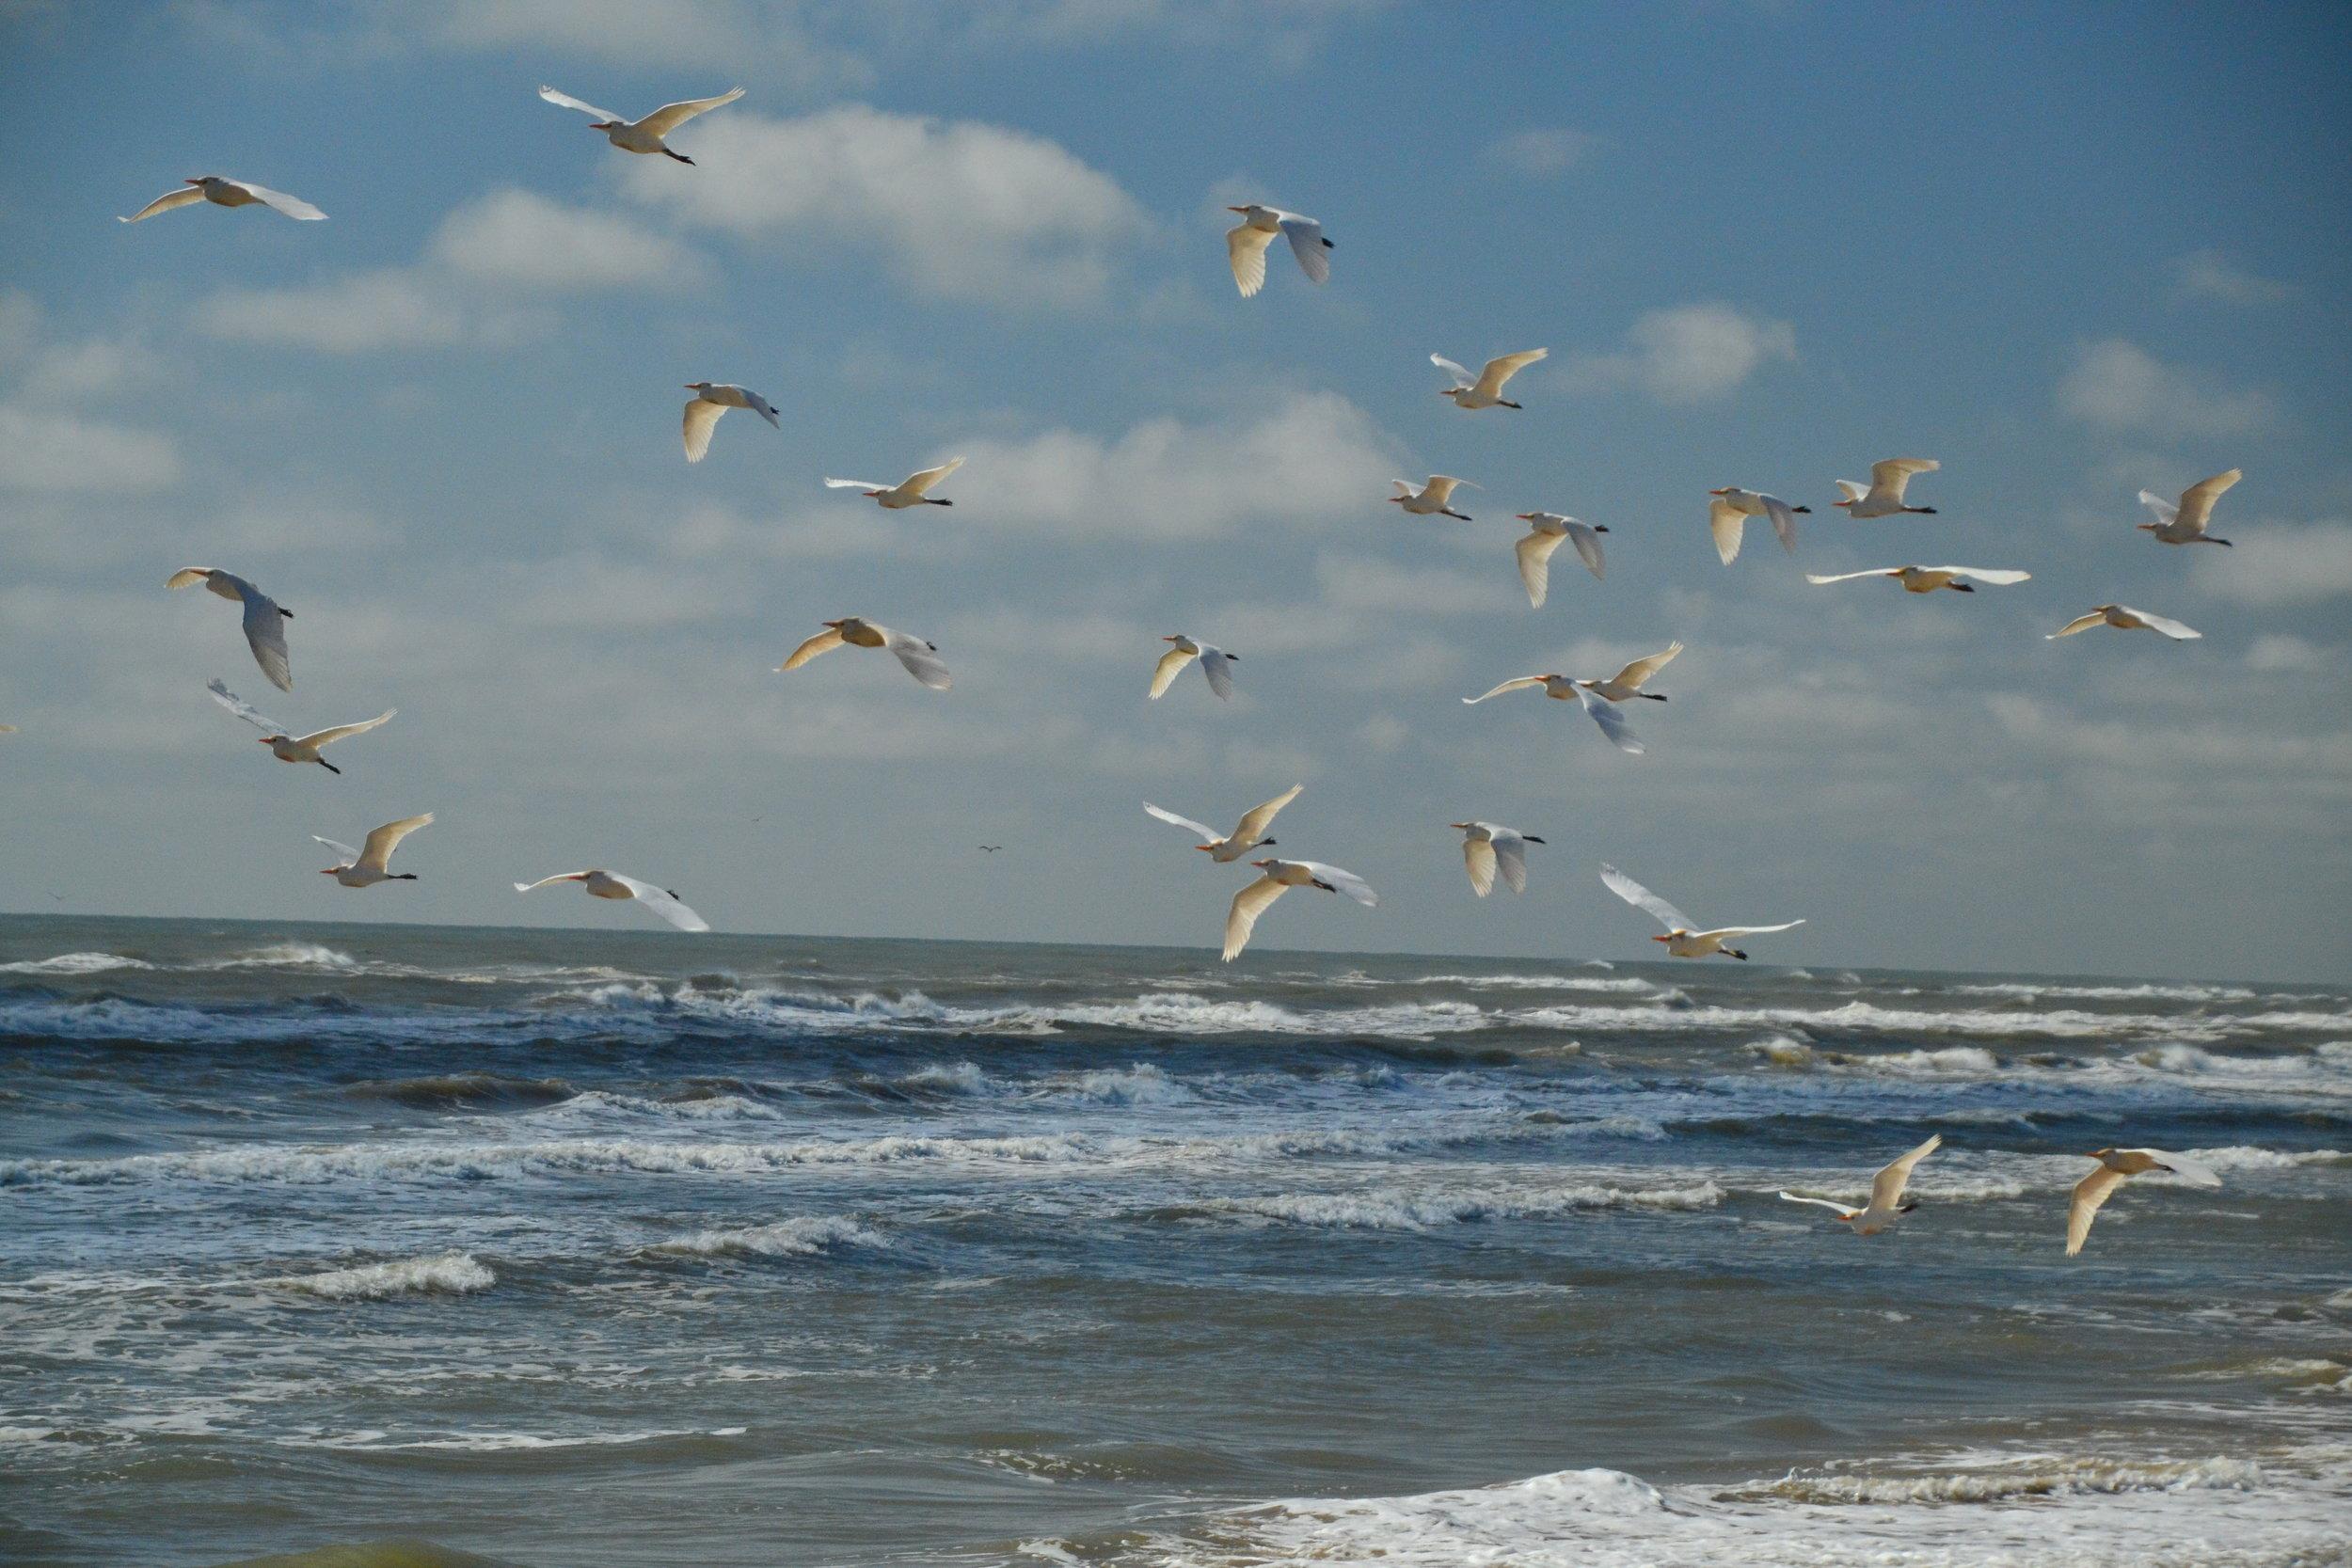 Spring Bird migration north. - Padre Island National Seashore